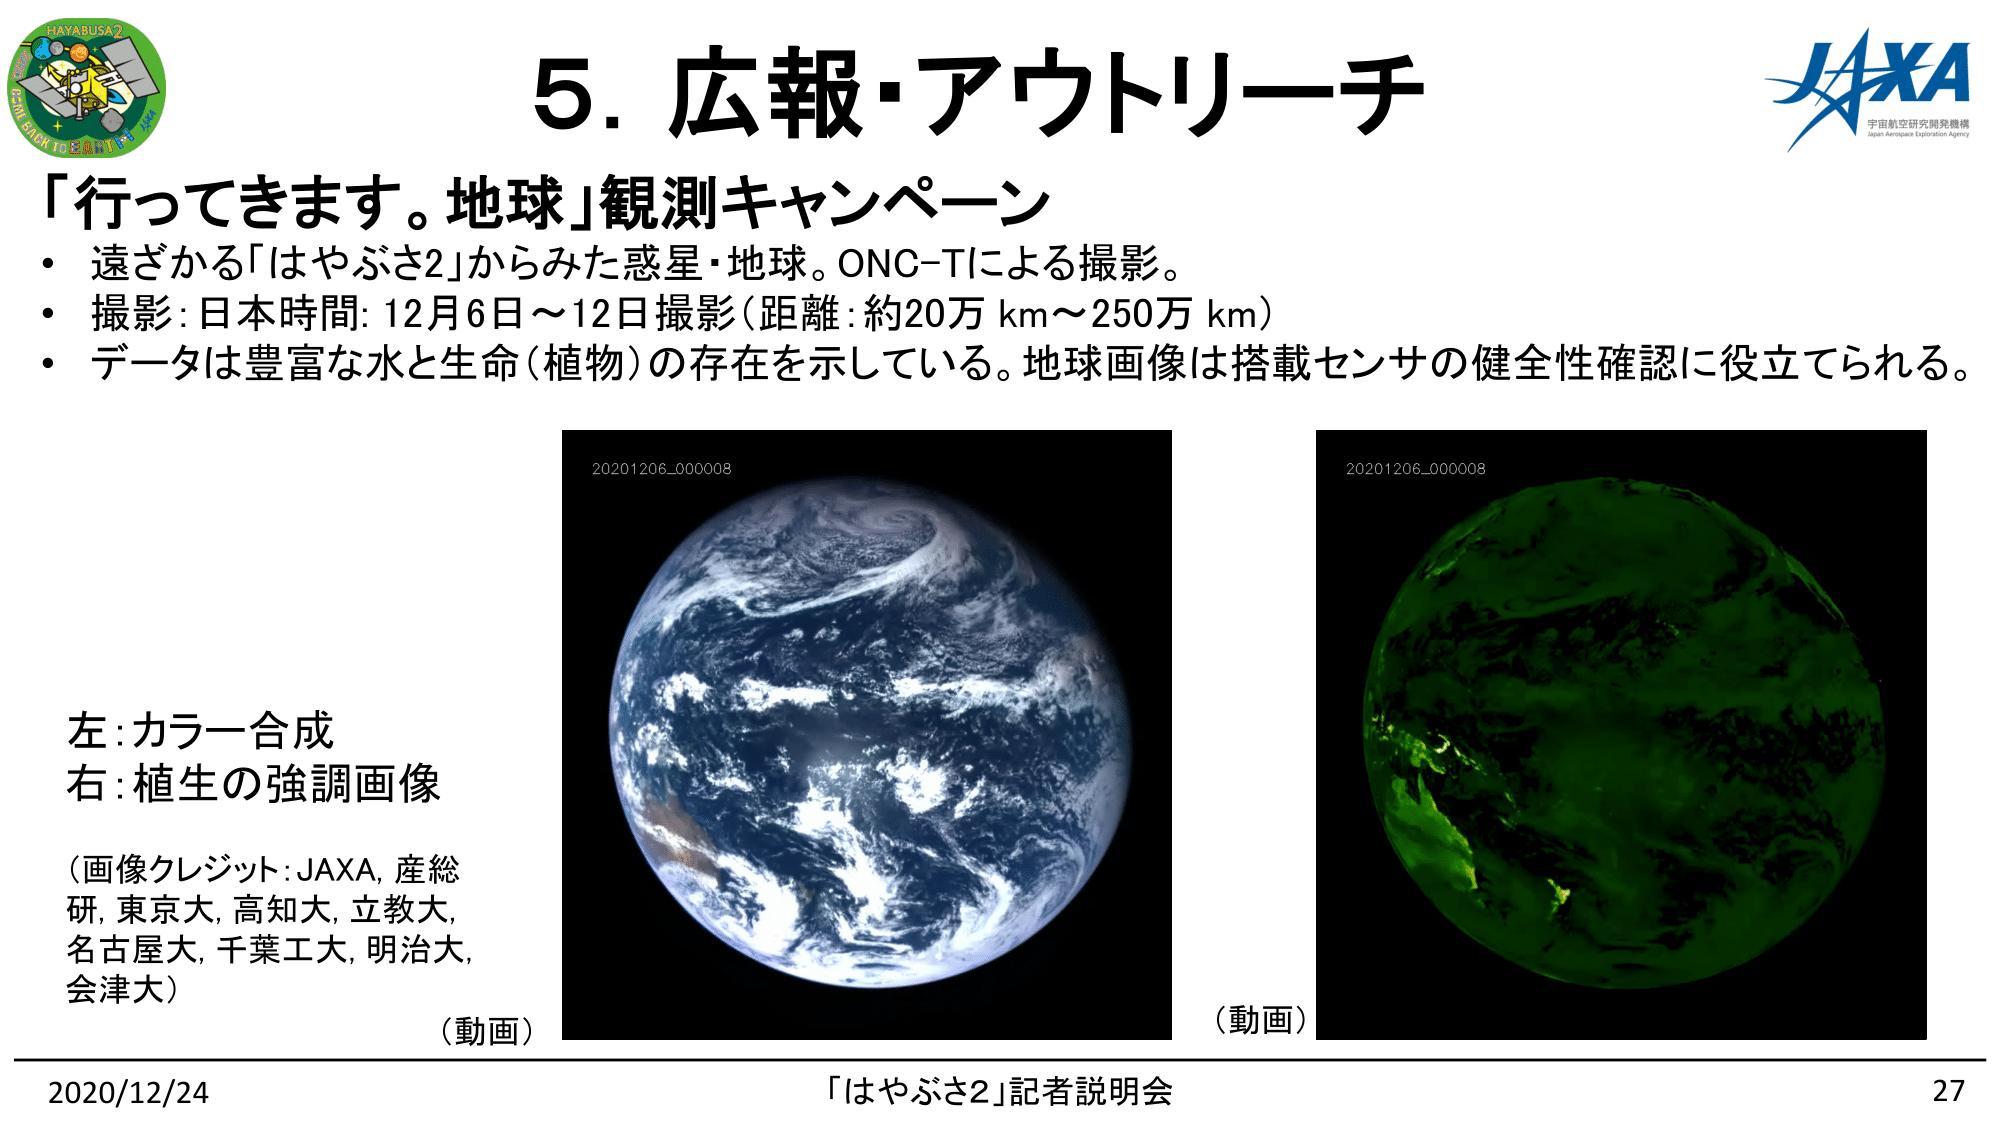 f:id:Imamura:20201224135303p:plain